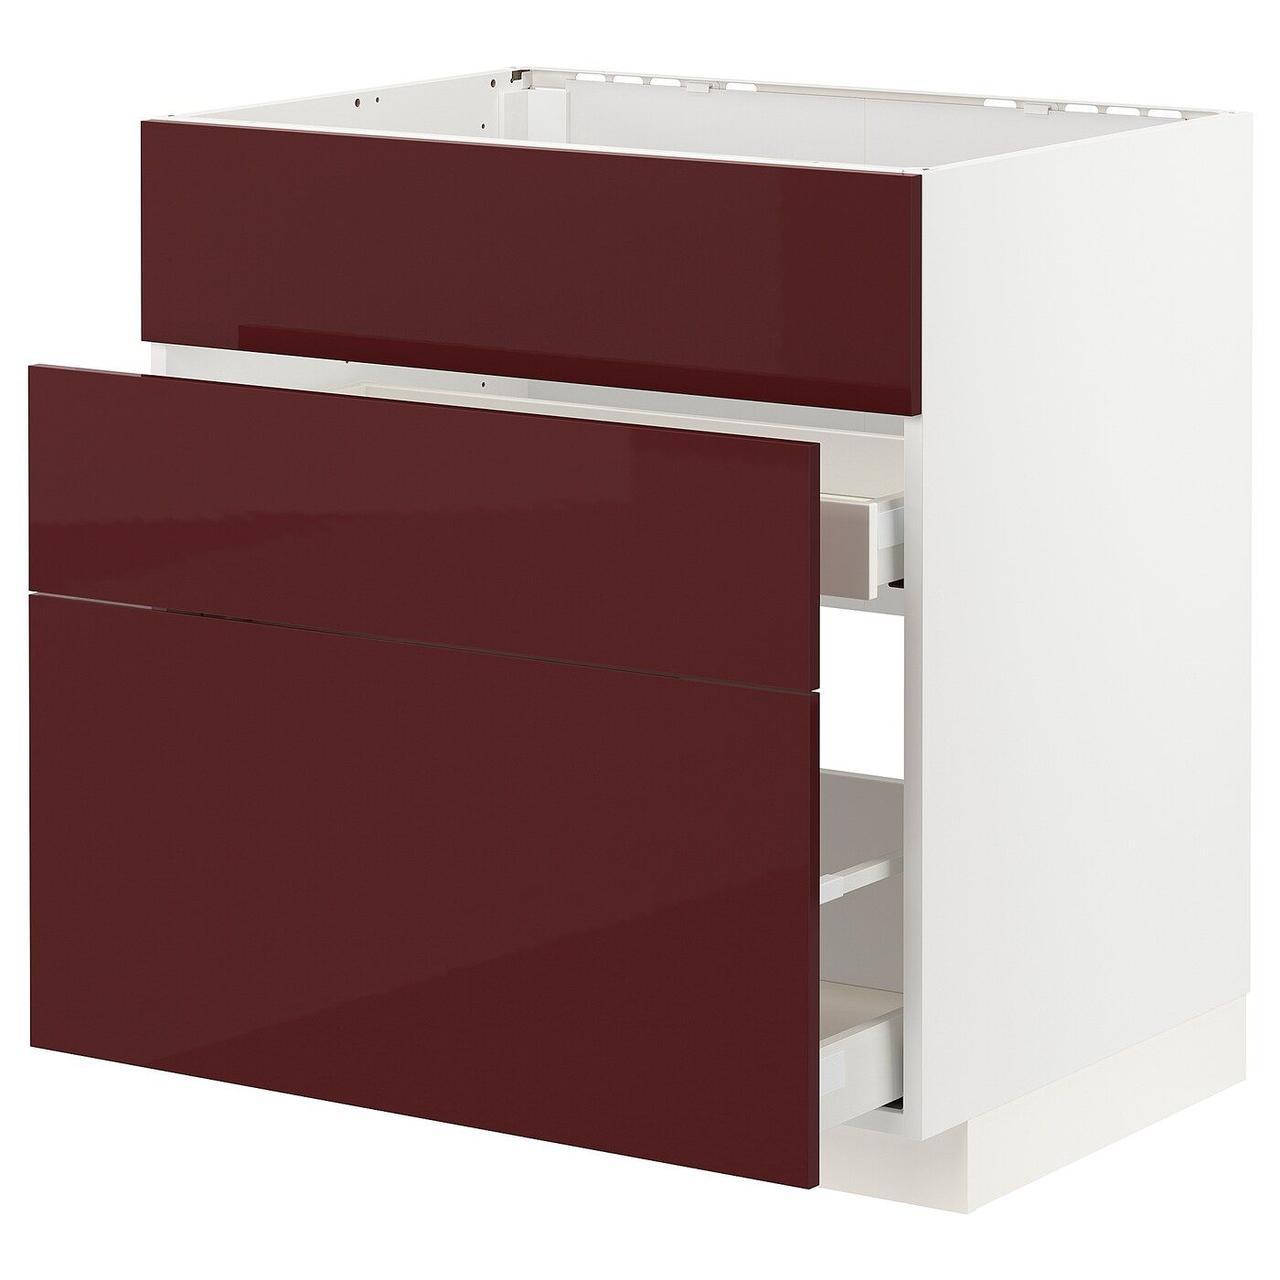 IKEA METOD / MAXIMERA (ІКЕА МЕТОДИ / MAXIMERA) 09327503